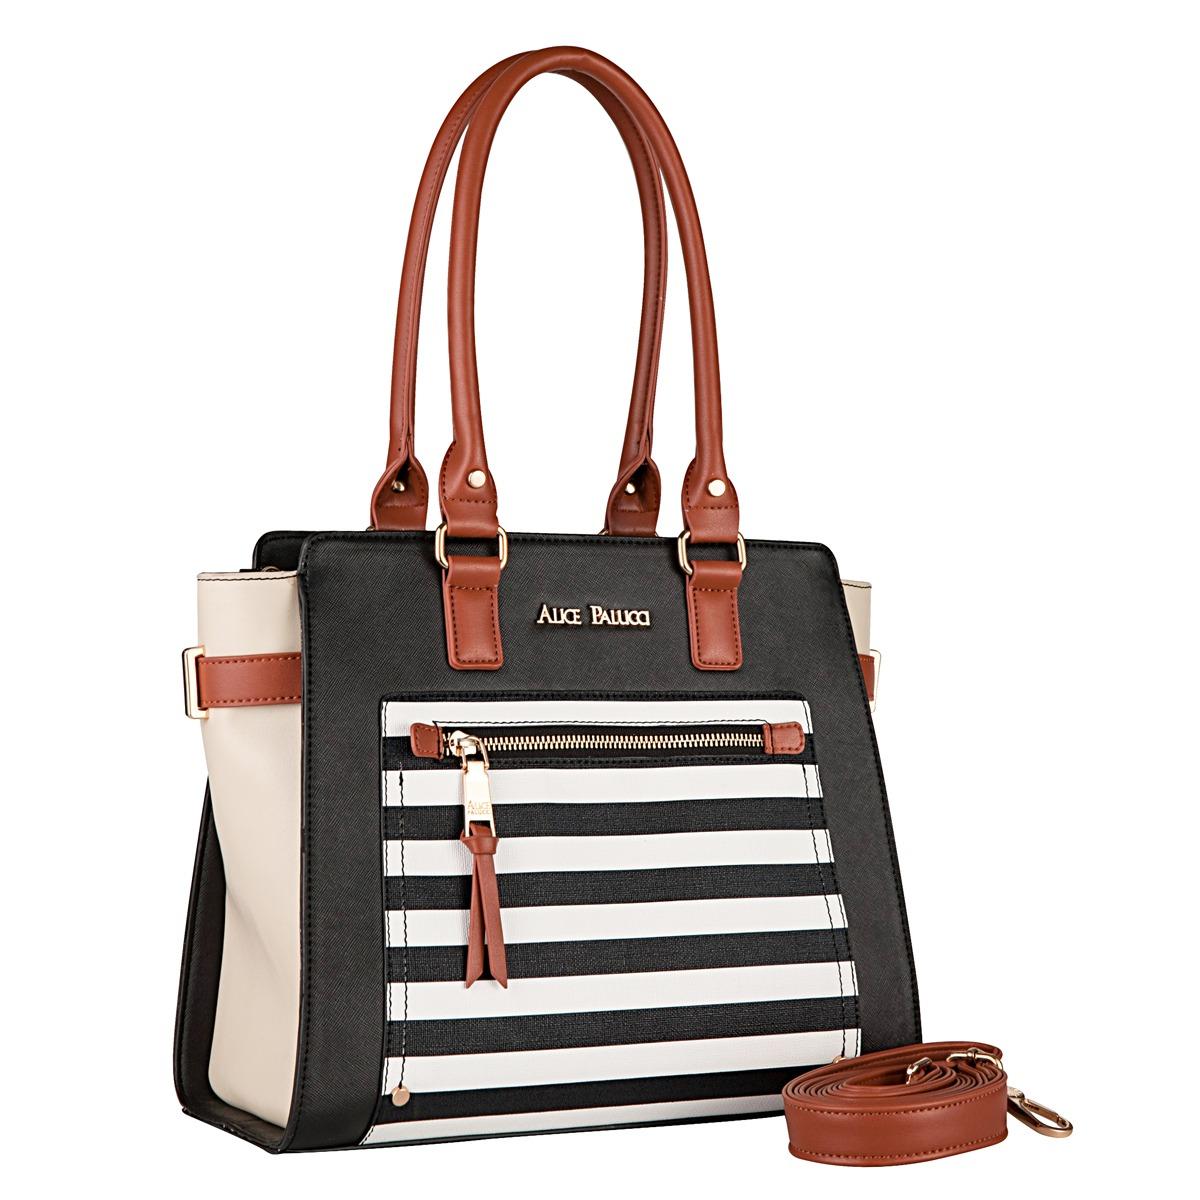 ac70b4093 Bolsa Tote Bag Transversal Navy Alice Palucci AL1902 Preta   boaloja